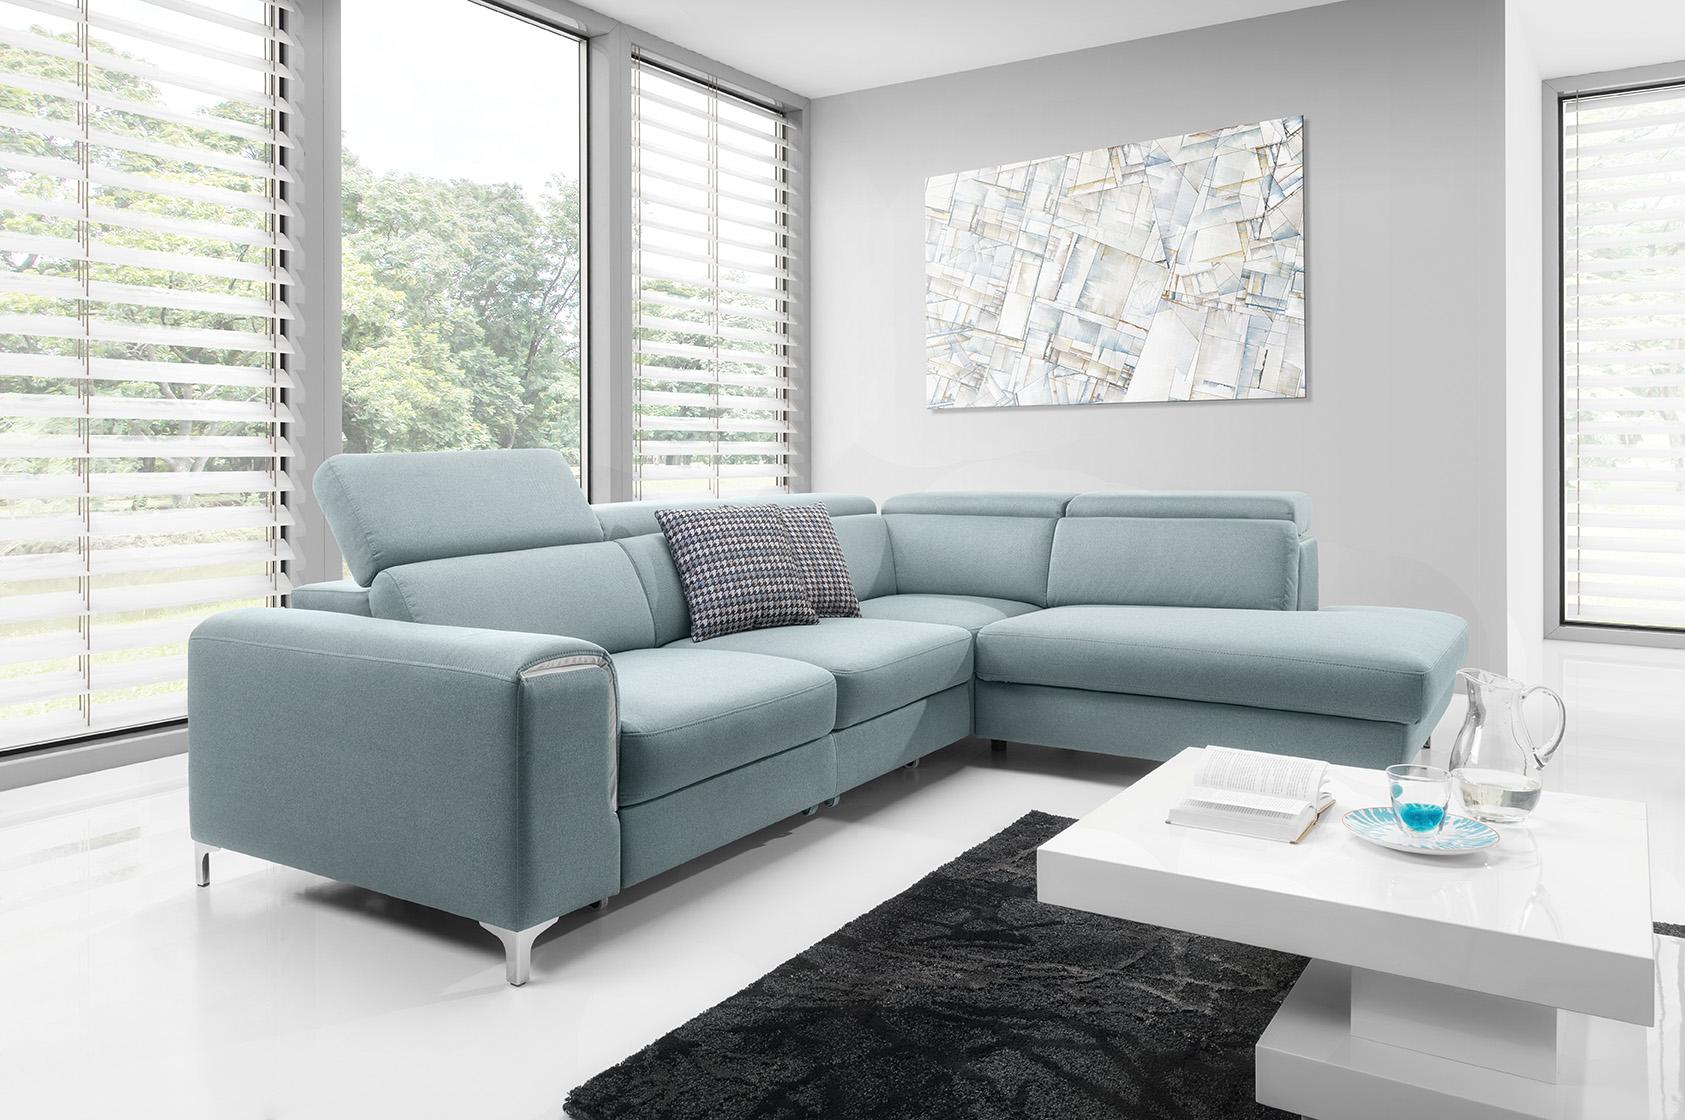 Sofa bed GENOVA OPEN by Furniturecity.ie